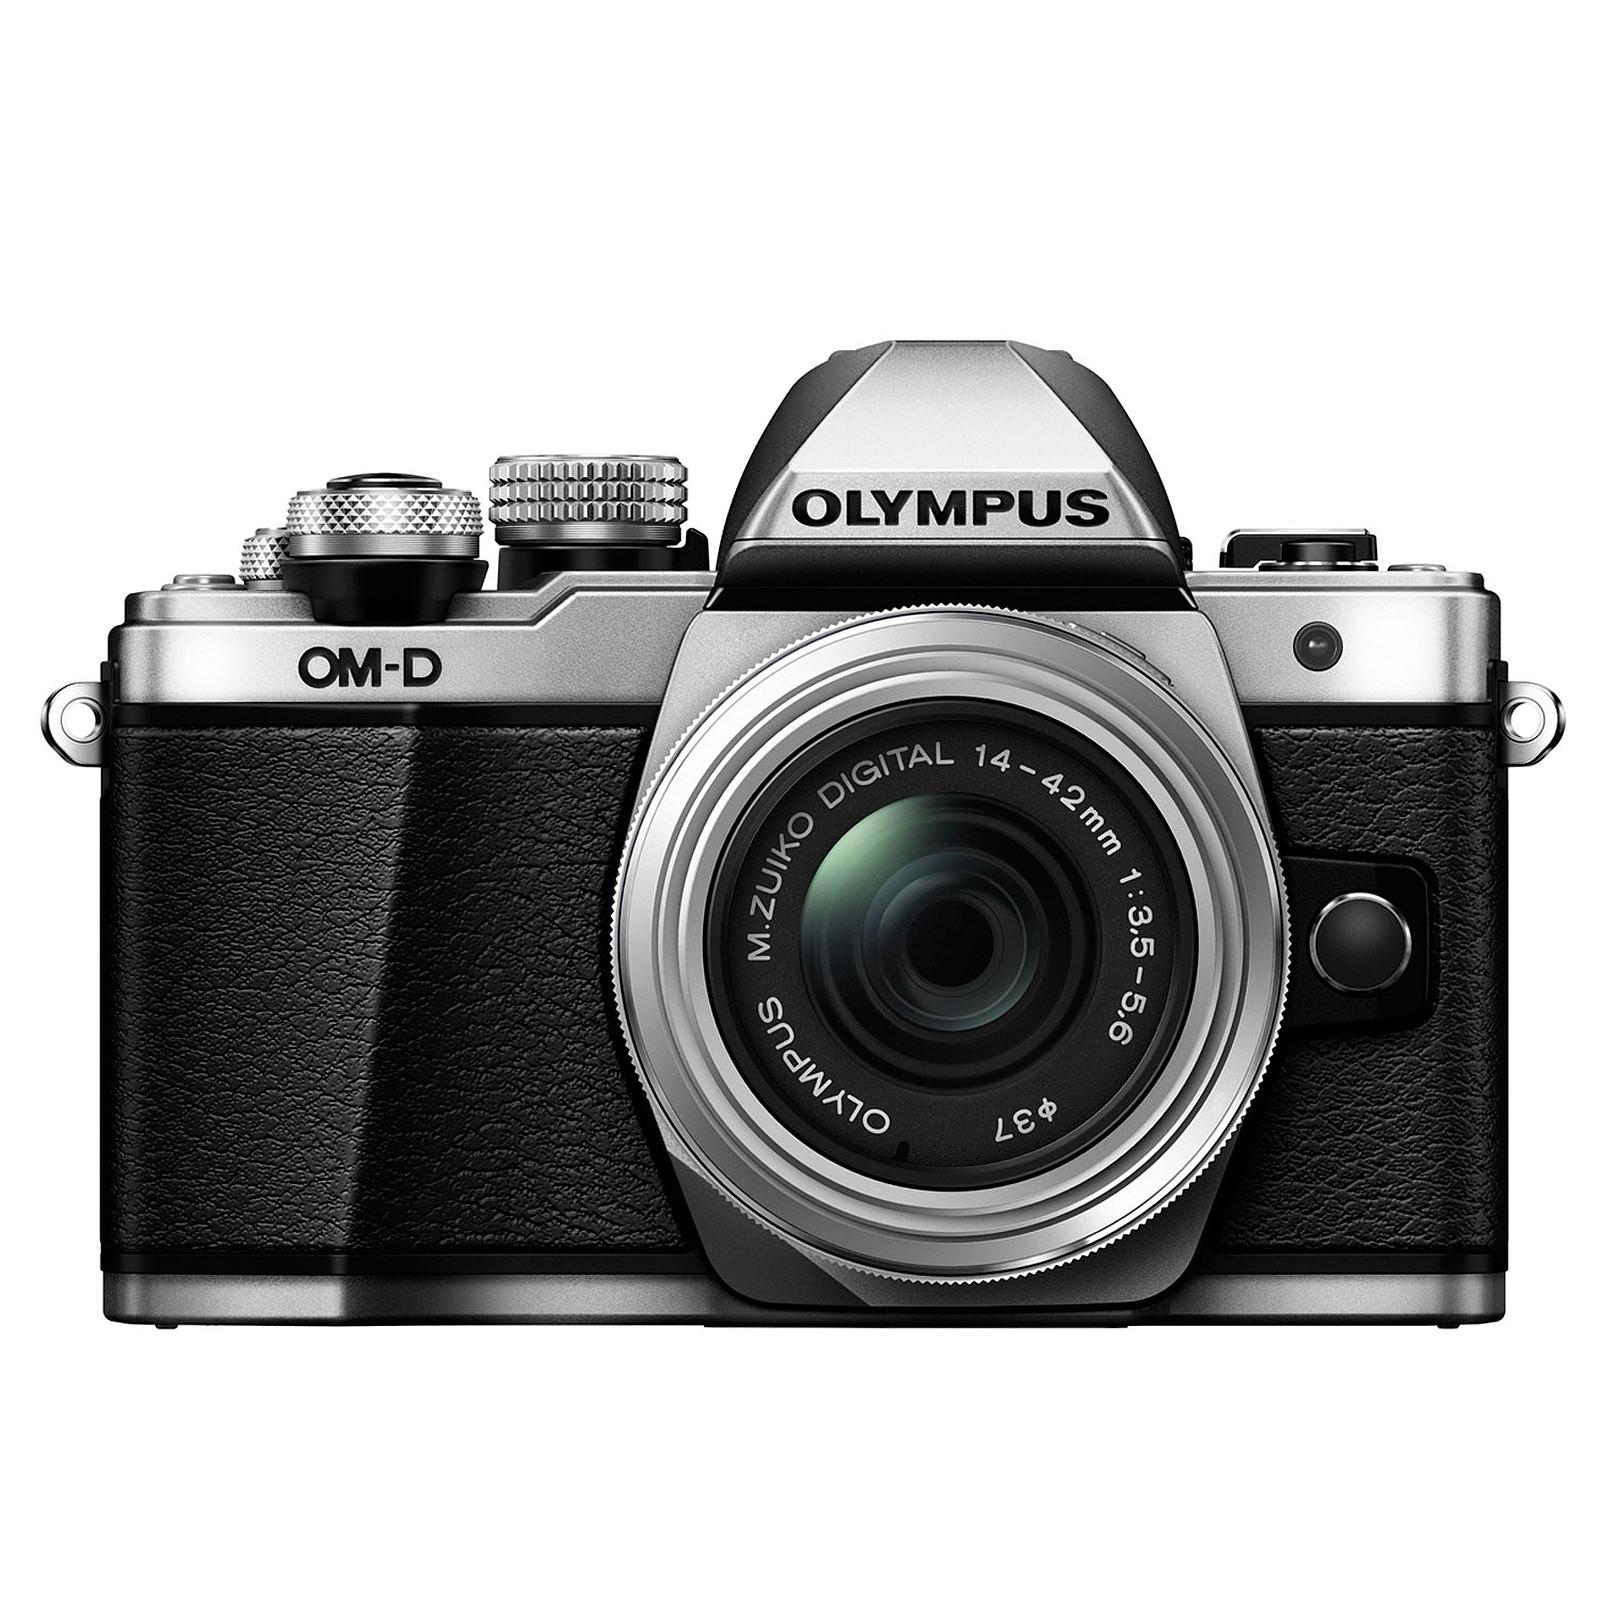 Olympus E-M10 MK II Argent + 14-42mm pancake